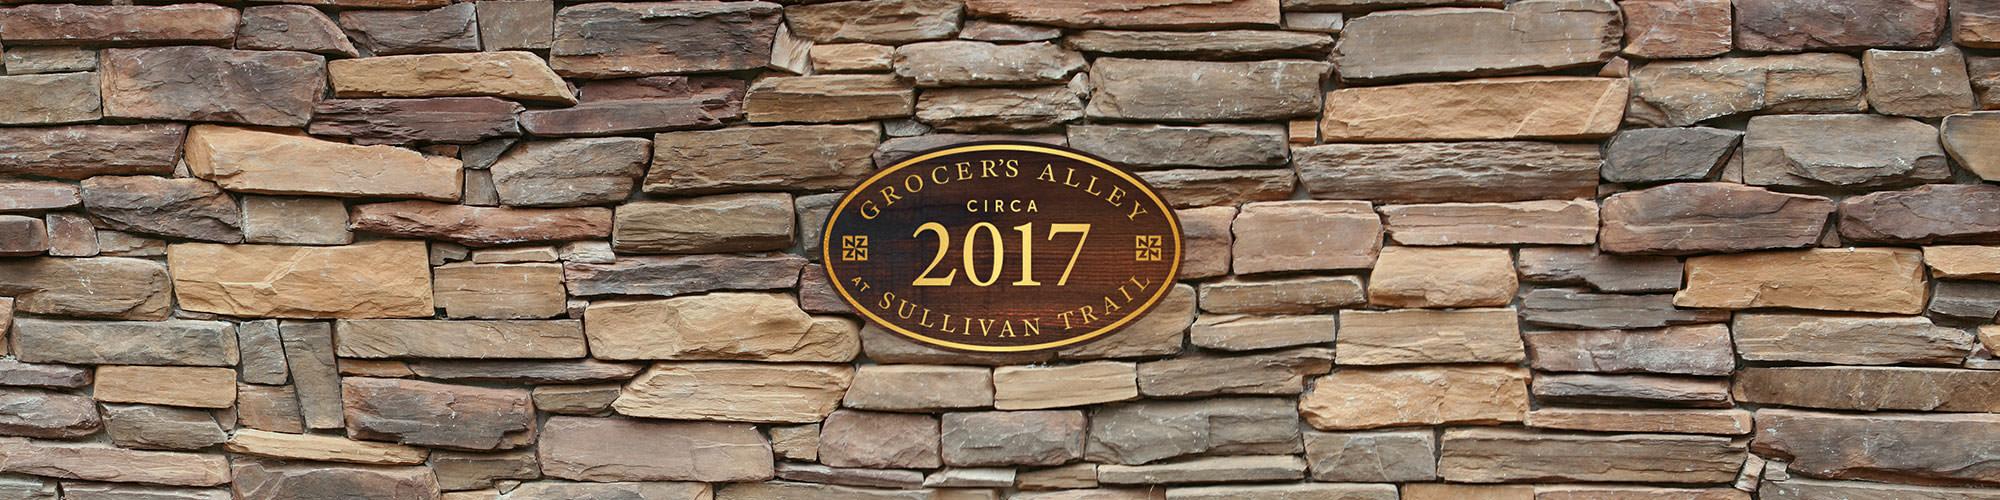 Grocer's Alley at Sullivan Trail